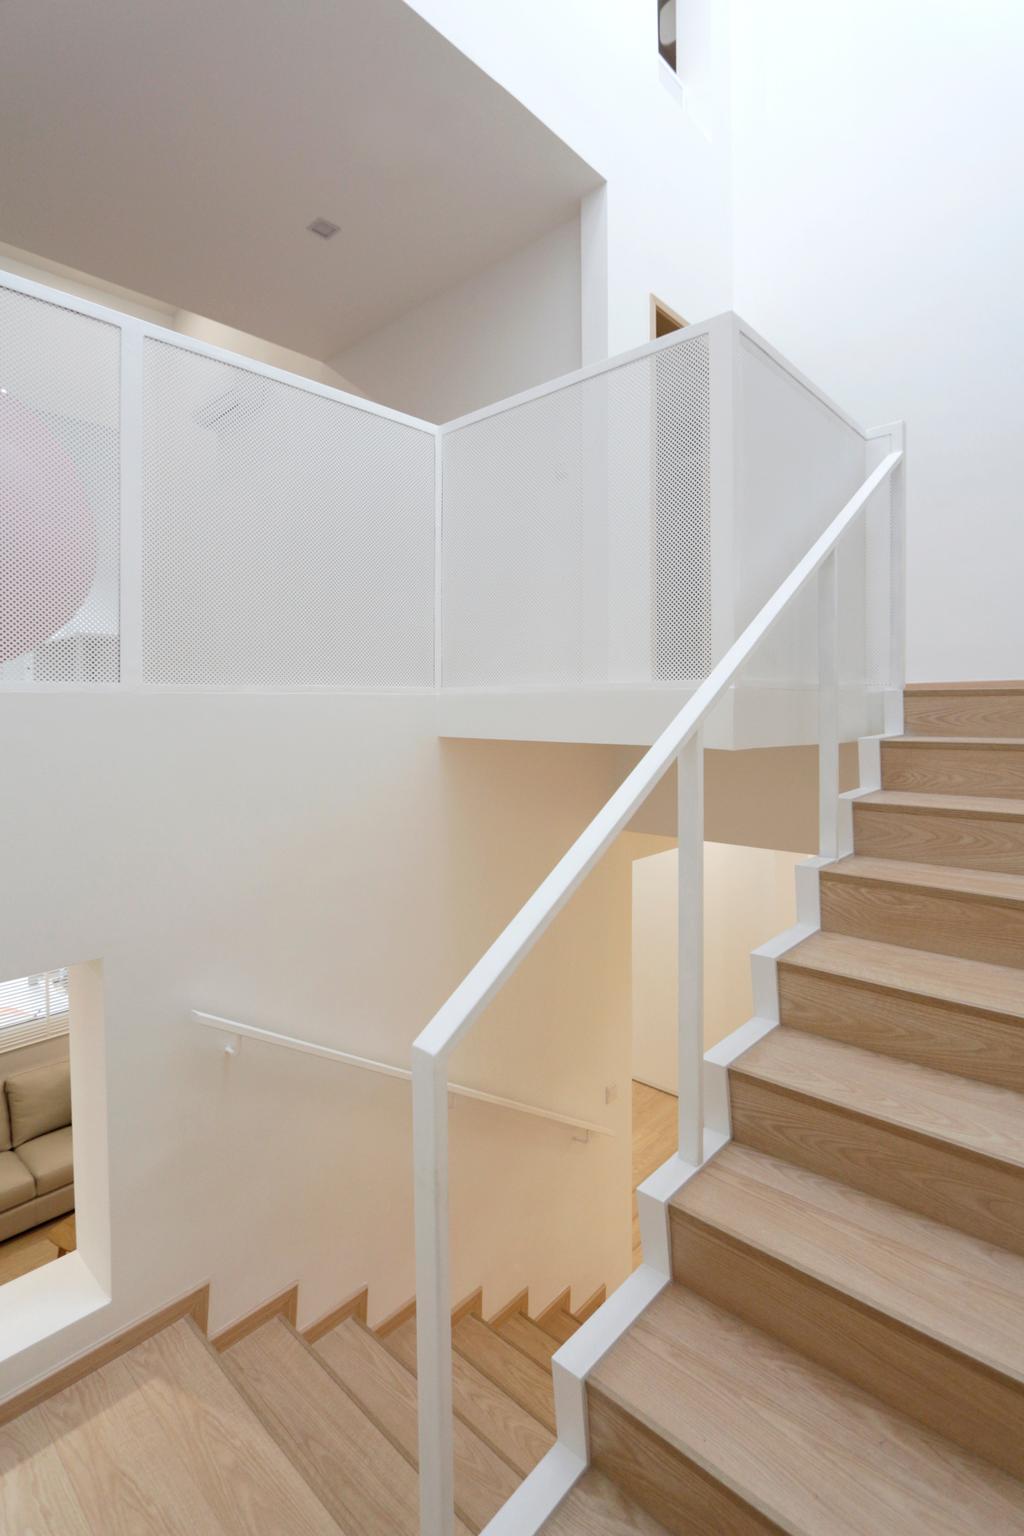 Minimalistic, Landed, Lentor Green, Architect, EHKA Studio, Banister, Handrail, Staircase